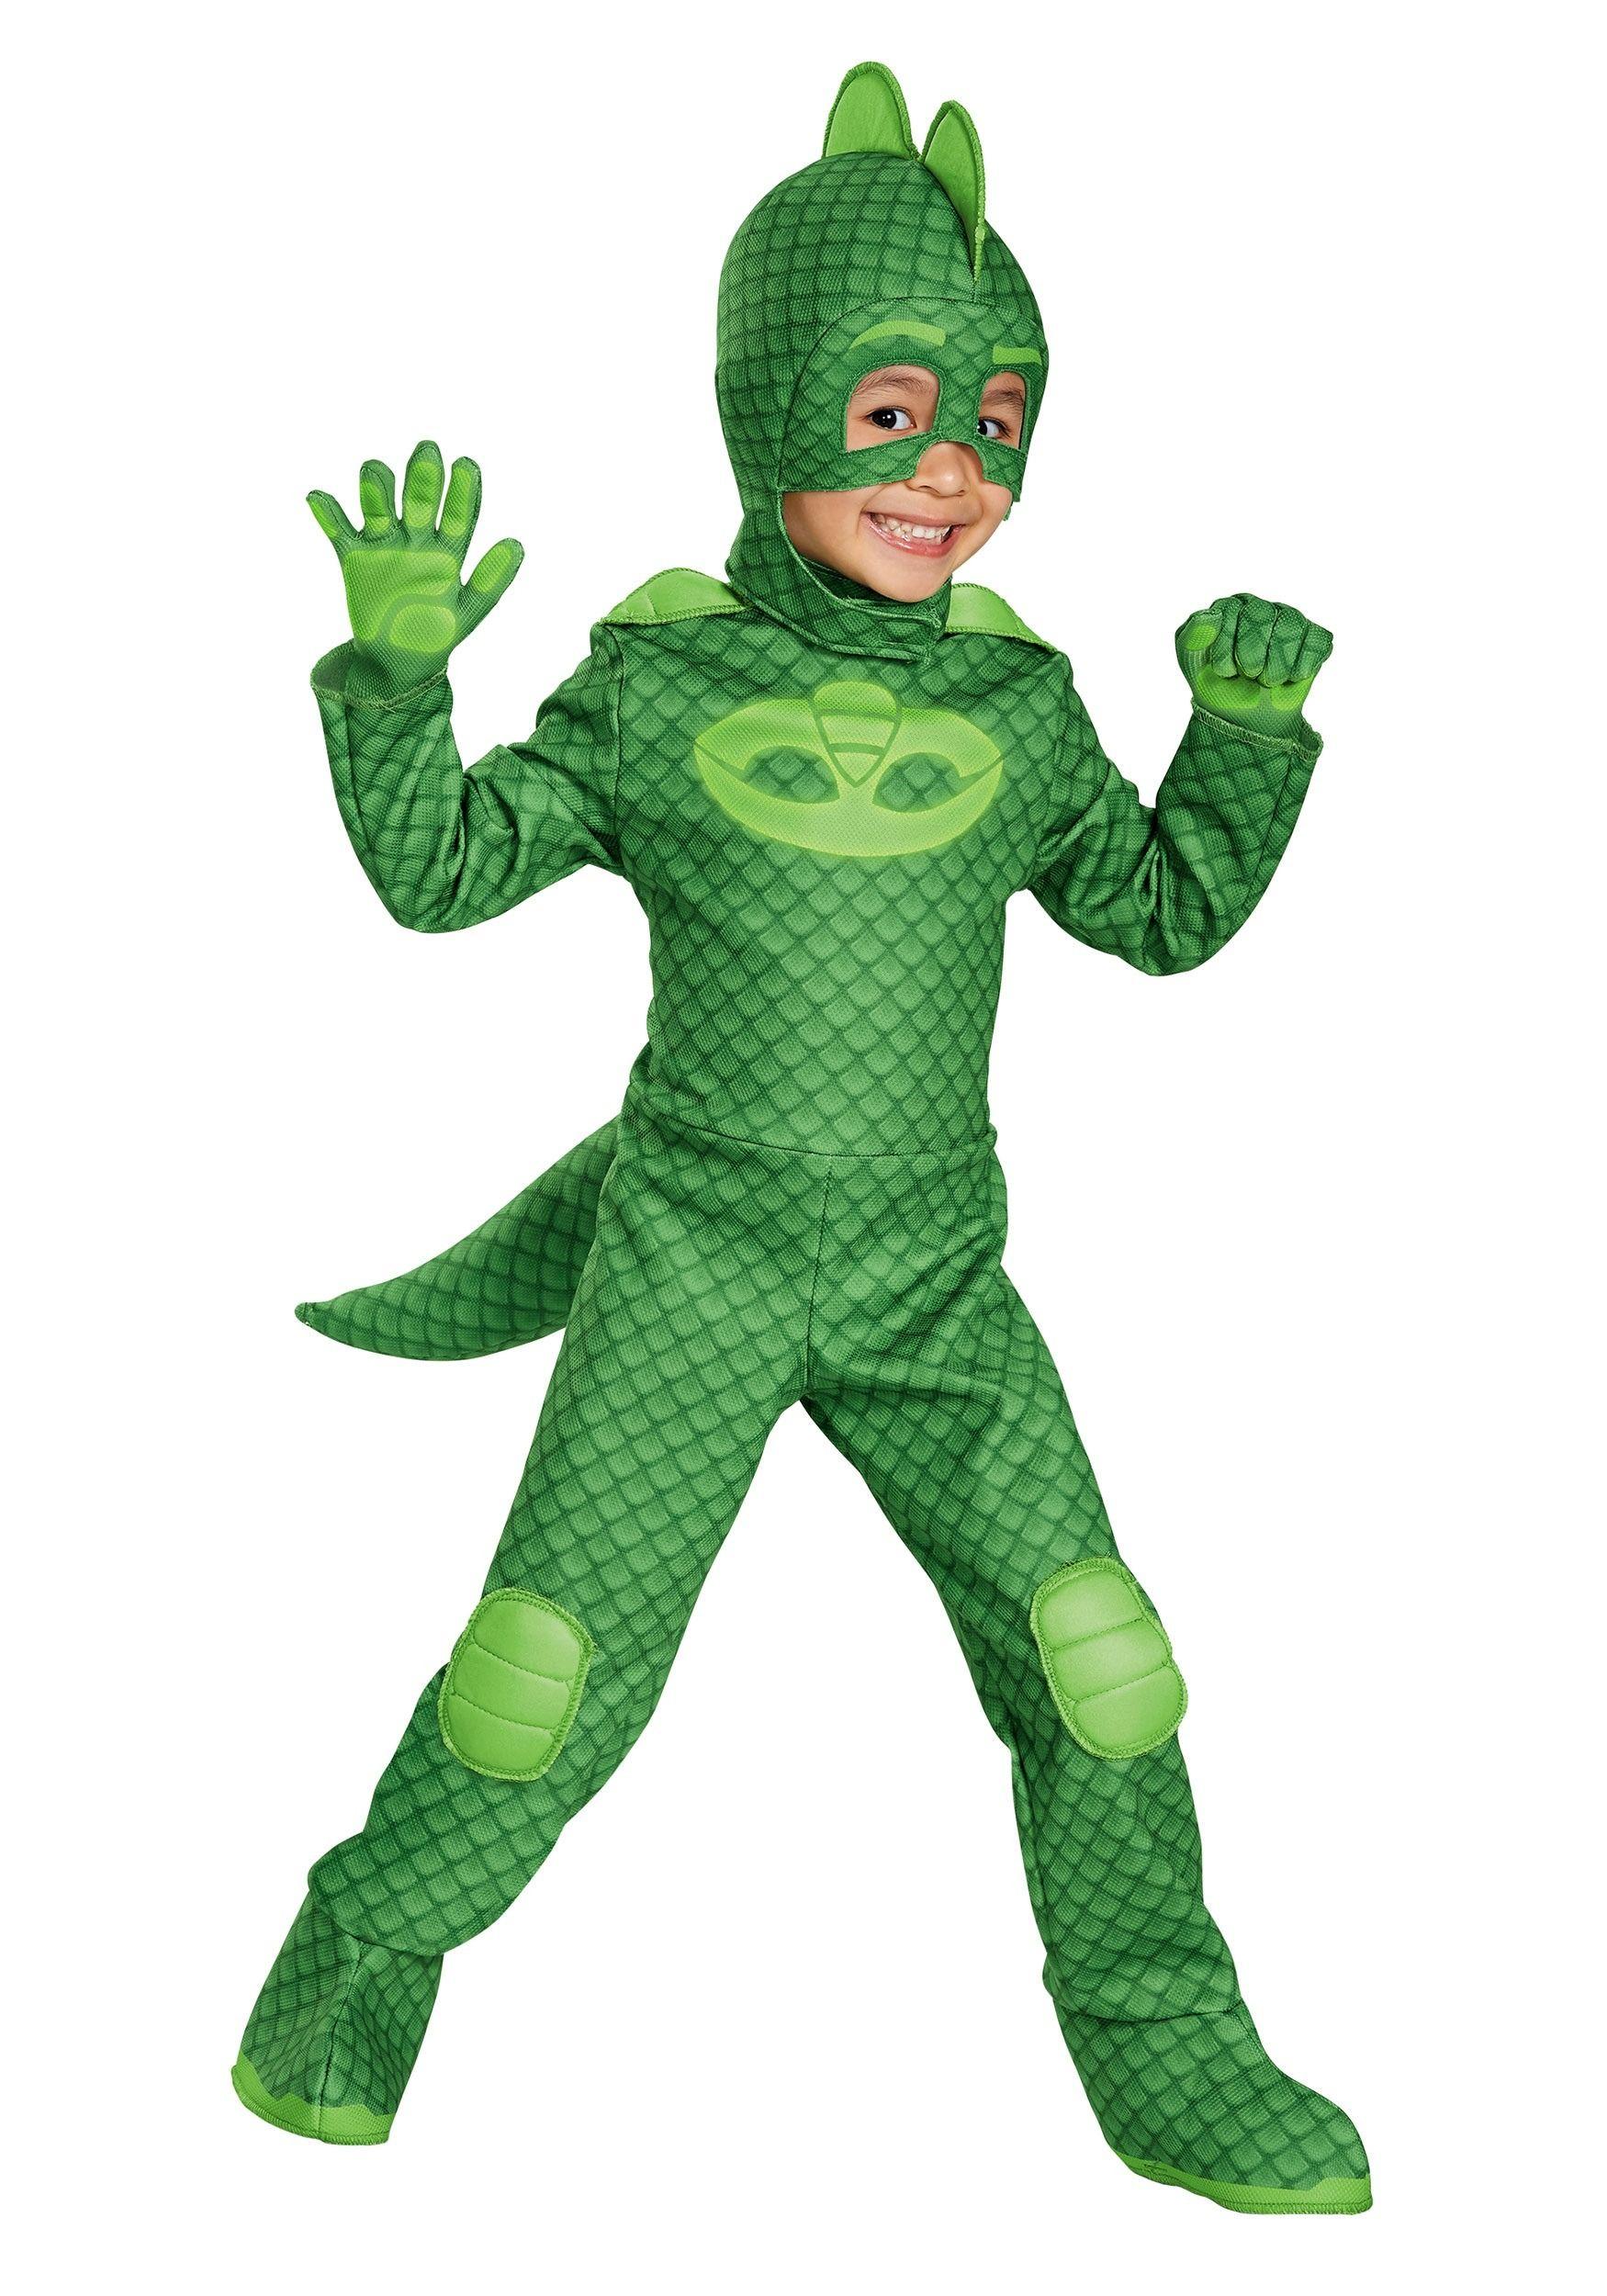 Deluxe PJ Masks Gekko Costume | Pj mask, Masking and Costumes